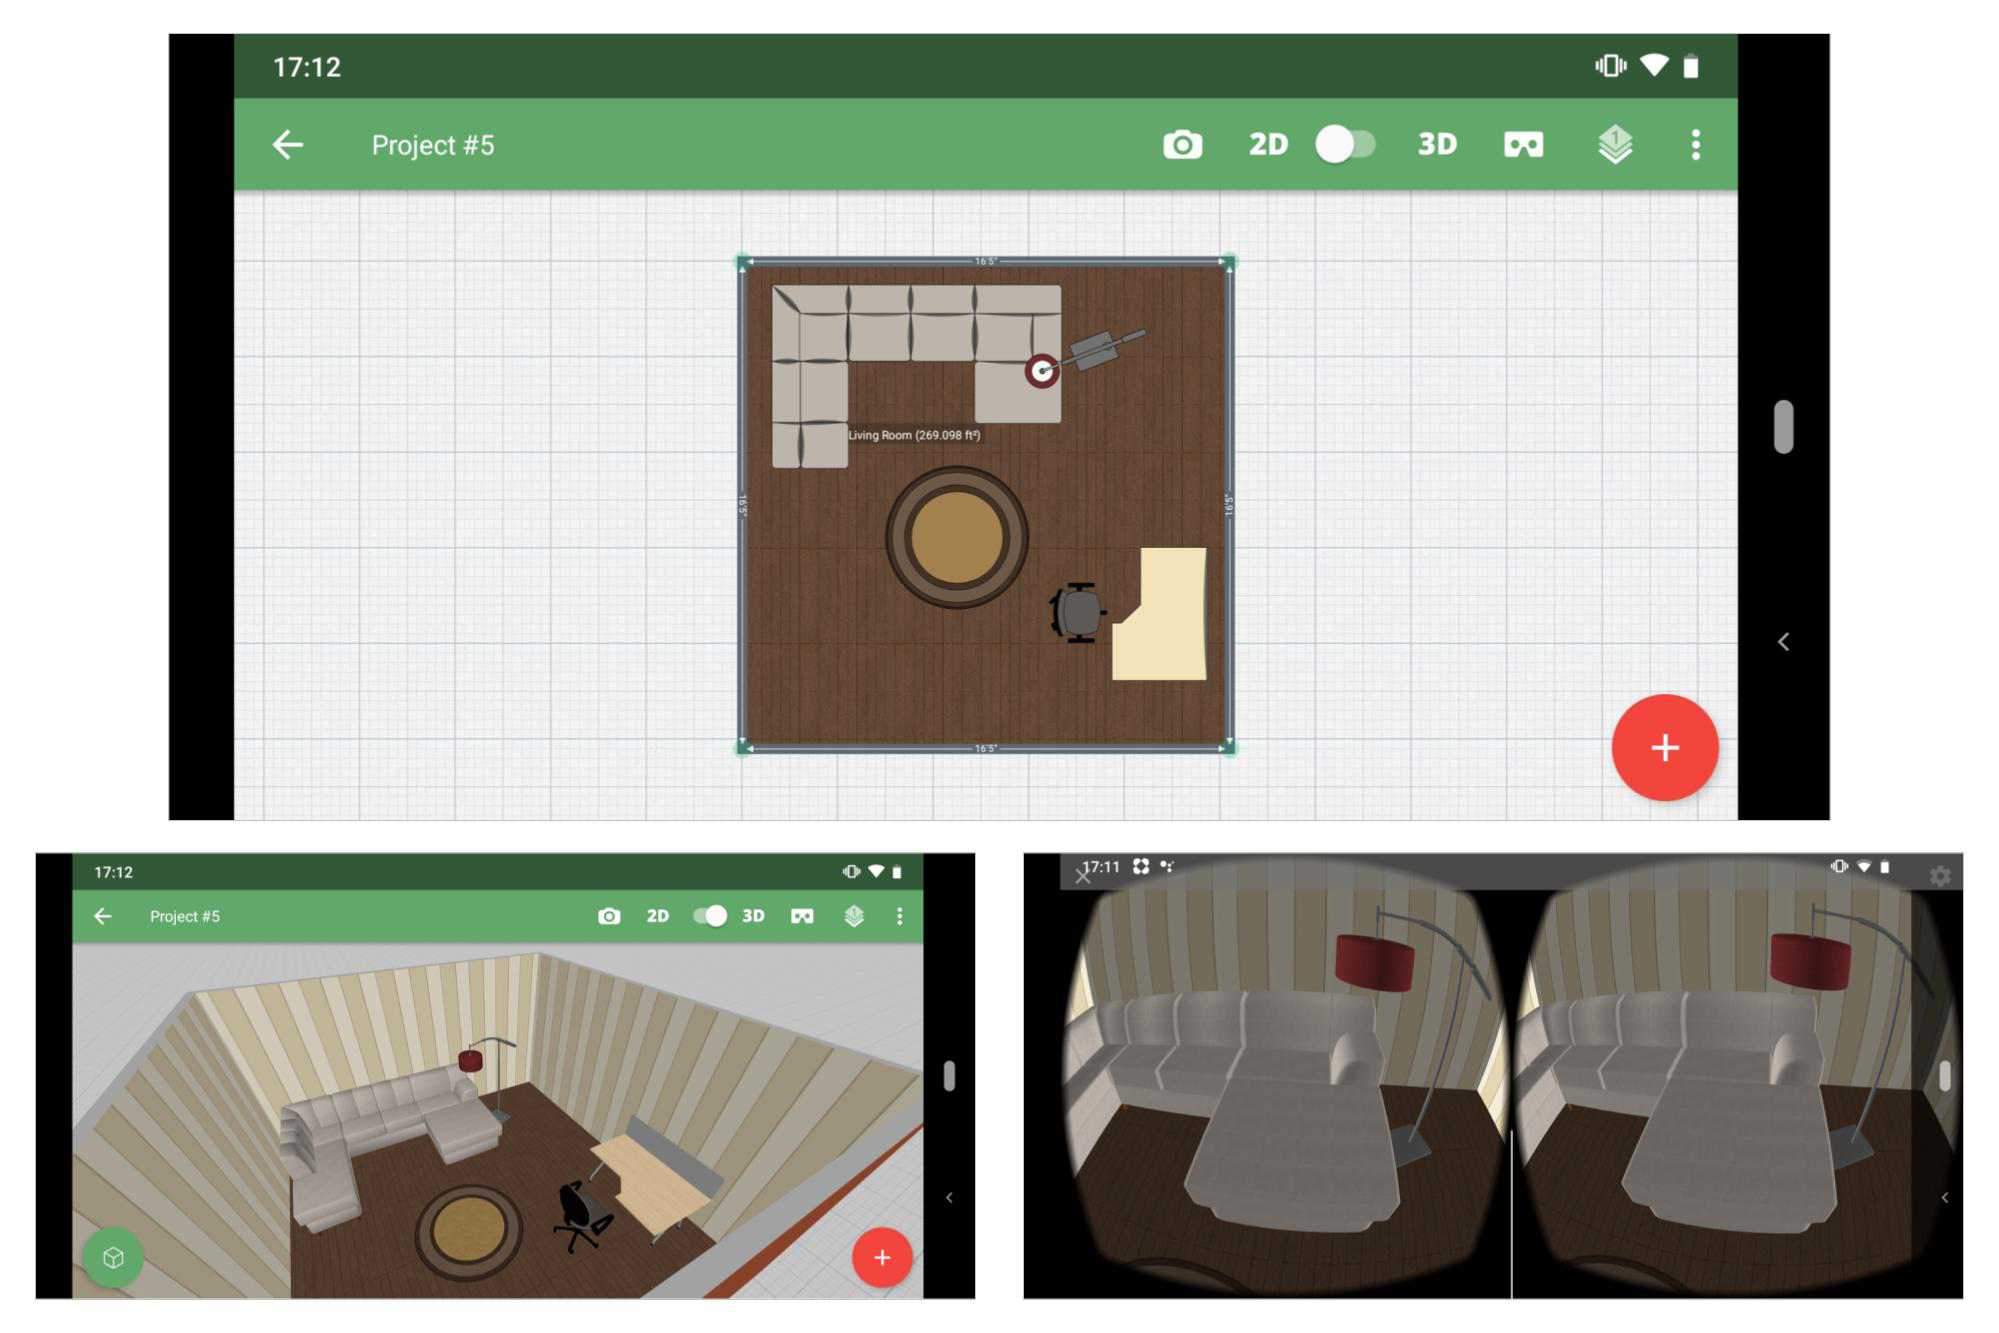 3 screenshots: (Top) 2D floor plan layout; (Bottom left) 3D room view; (Bottom right) Google Cardboard virtual reality view